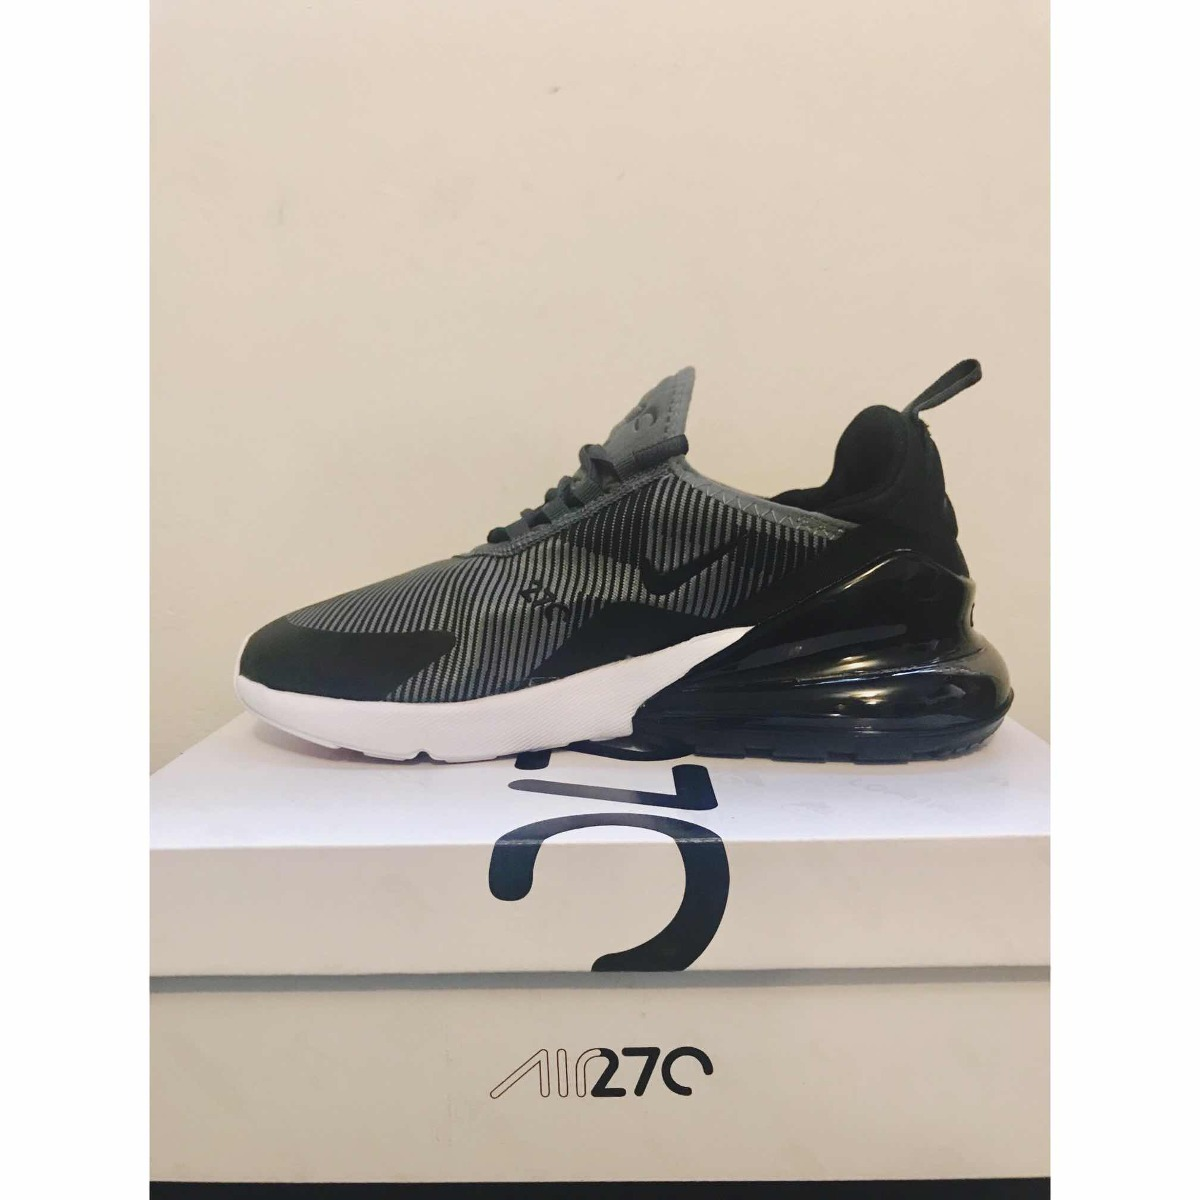 a2842ccbb2c Tenis Nike Air Max 270 Negro Con Gris Para Caballero -   1